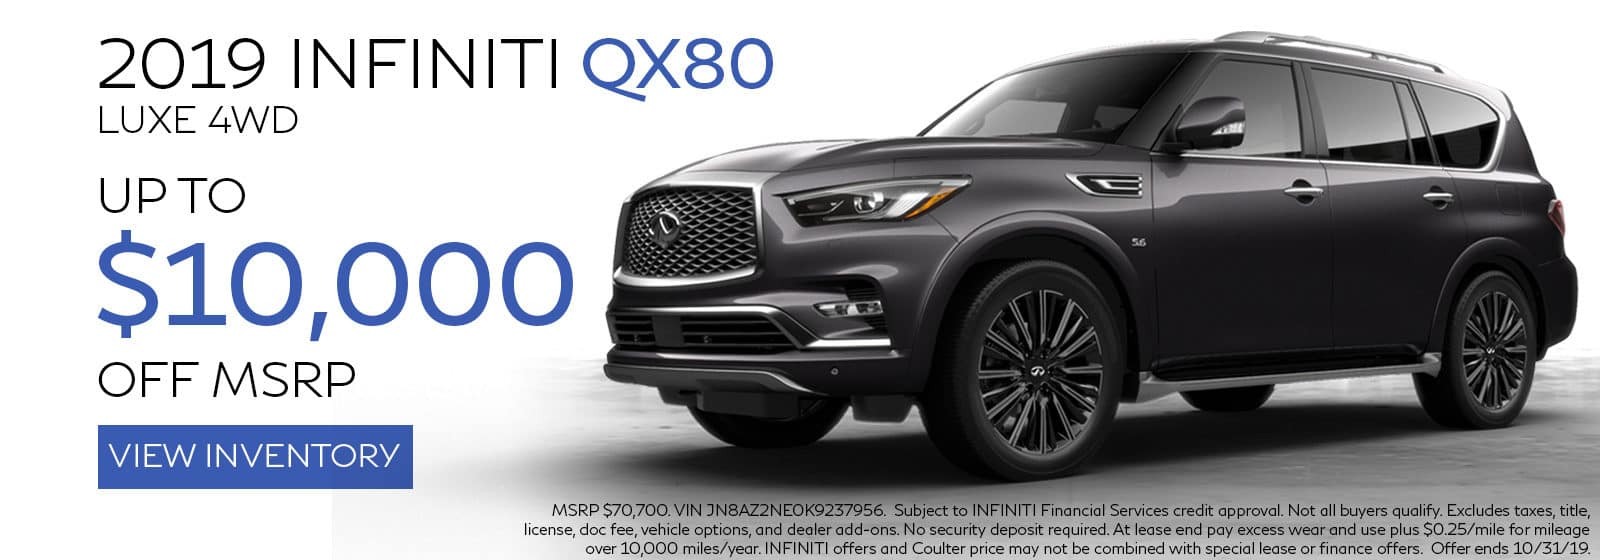 2019 INFINITI QX80 offer at Coulter INFINITI Near Scottsdale Arizona